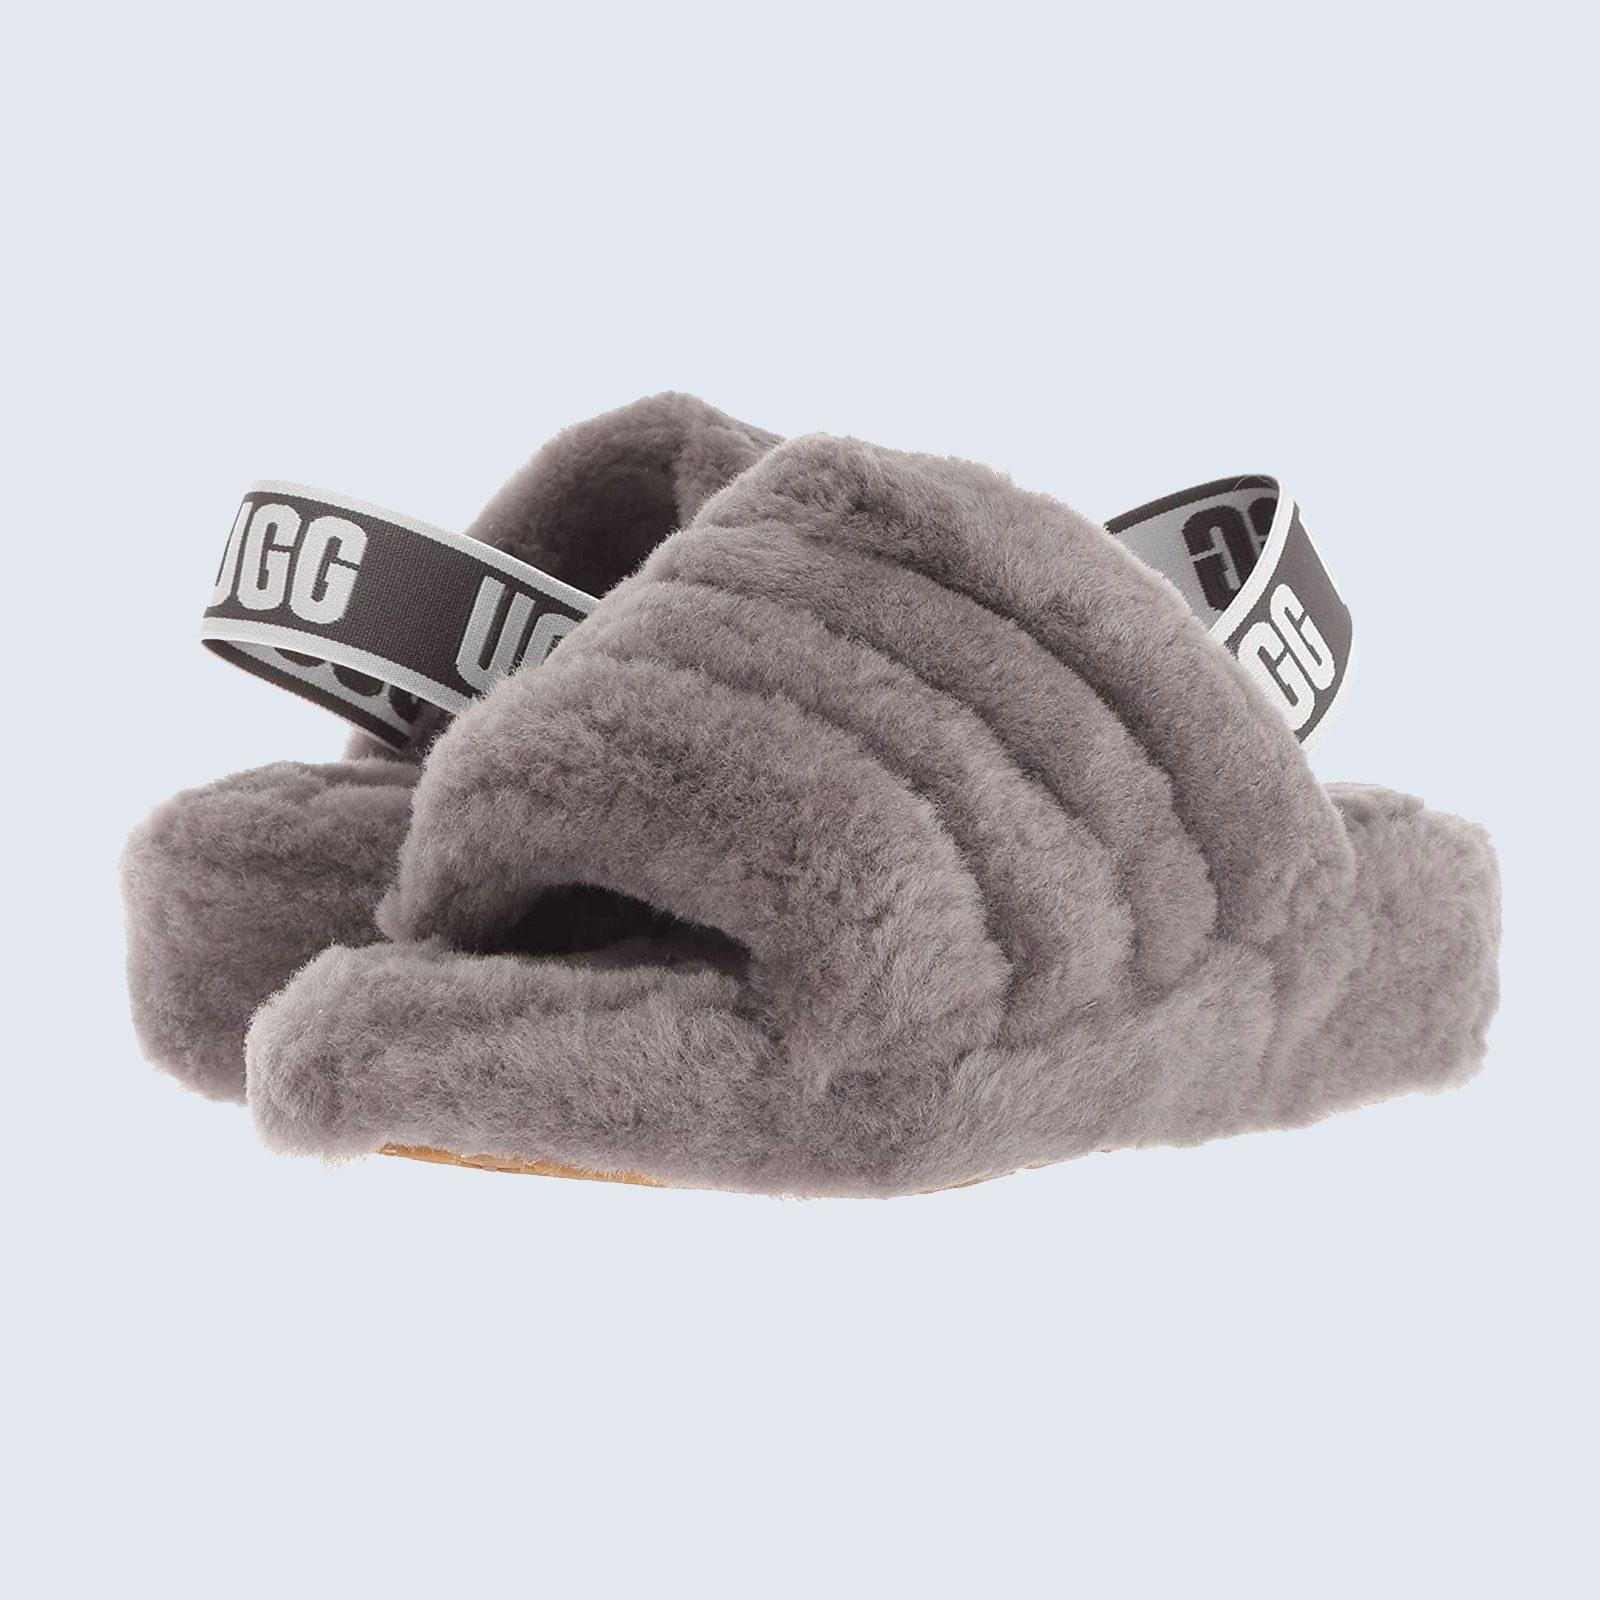 Most stylish slippers: Ugg Fluff Yeah Slipper